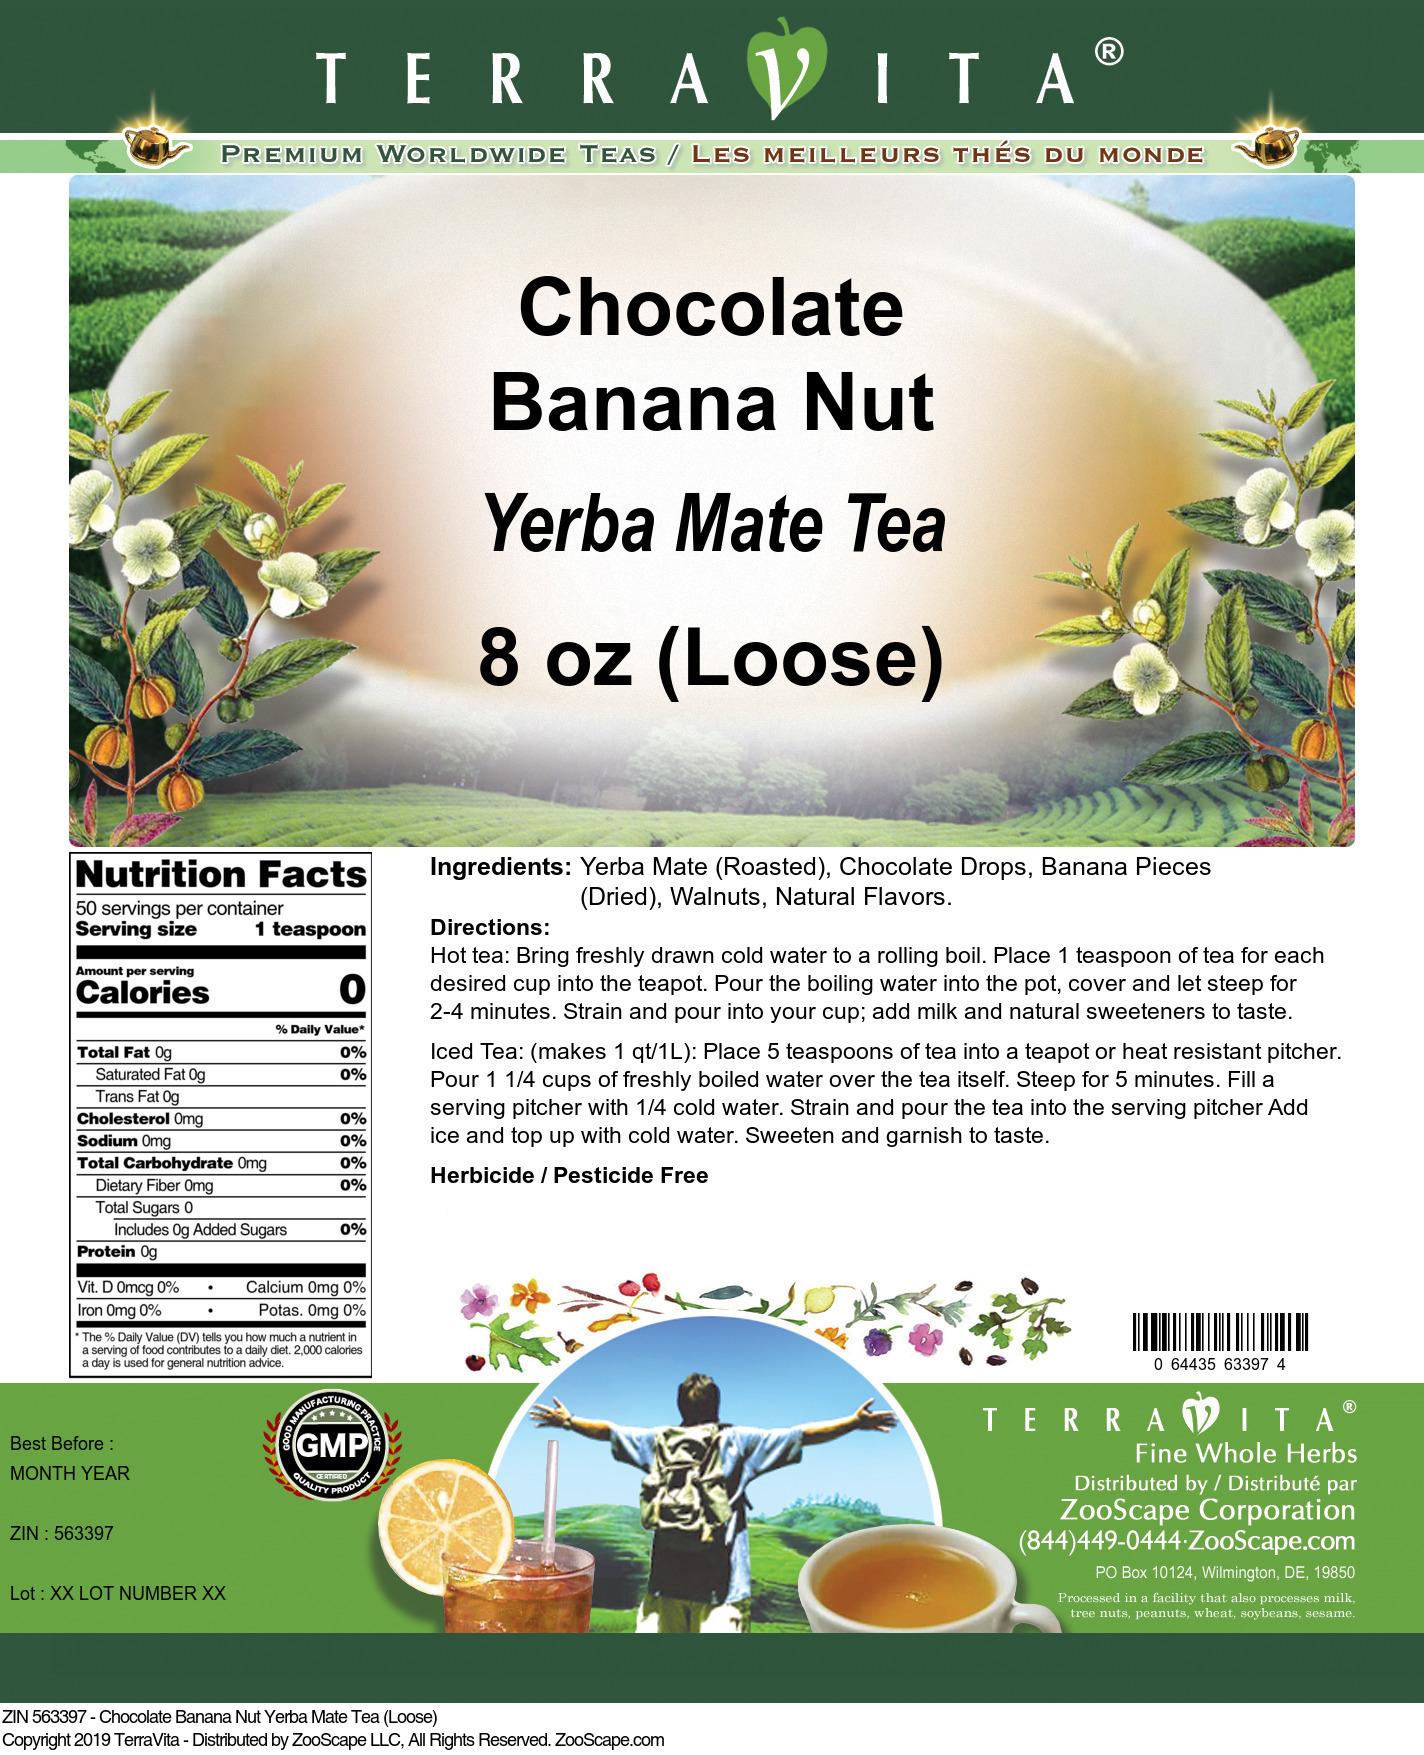 Chocolate Banana Nut Yerba Mate Tea (Loose)